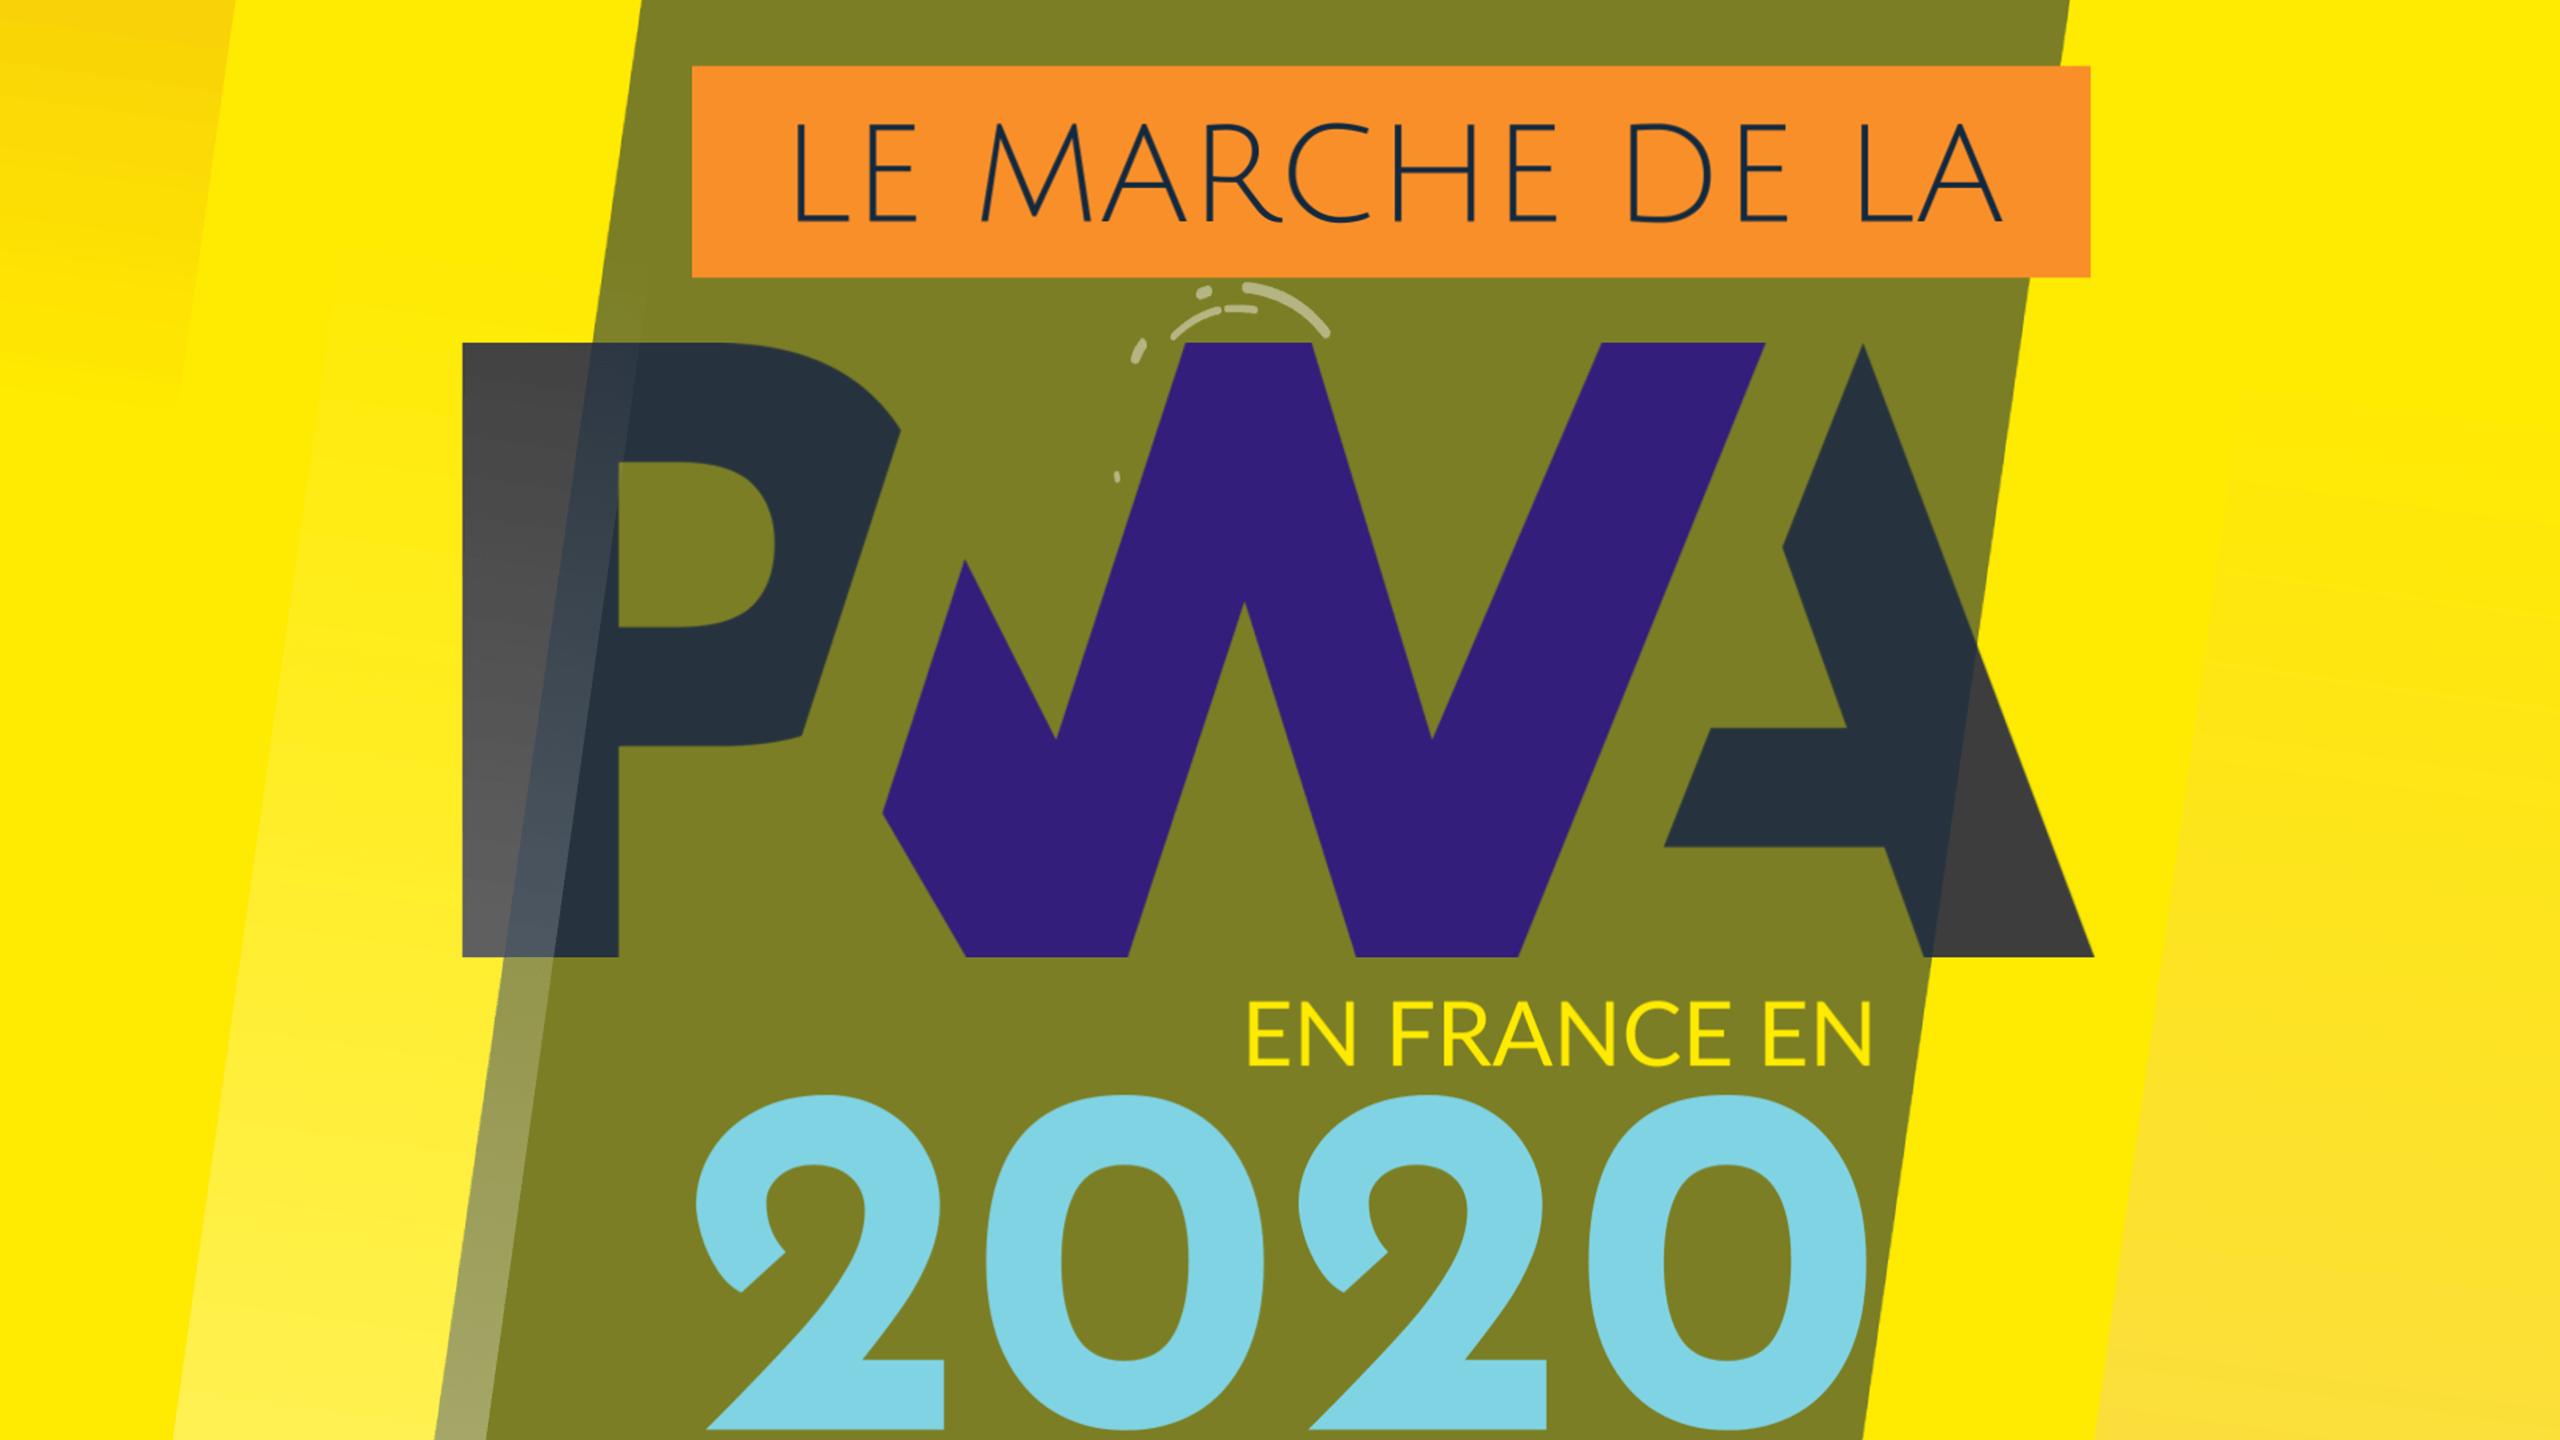 Marché de la PWA (Progressive Web App) France 2020